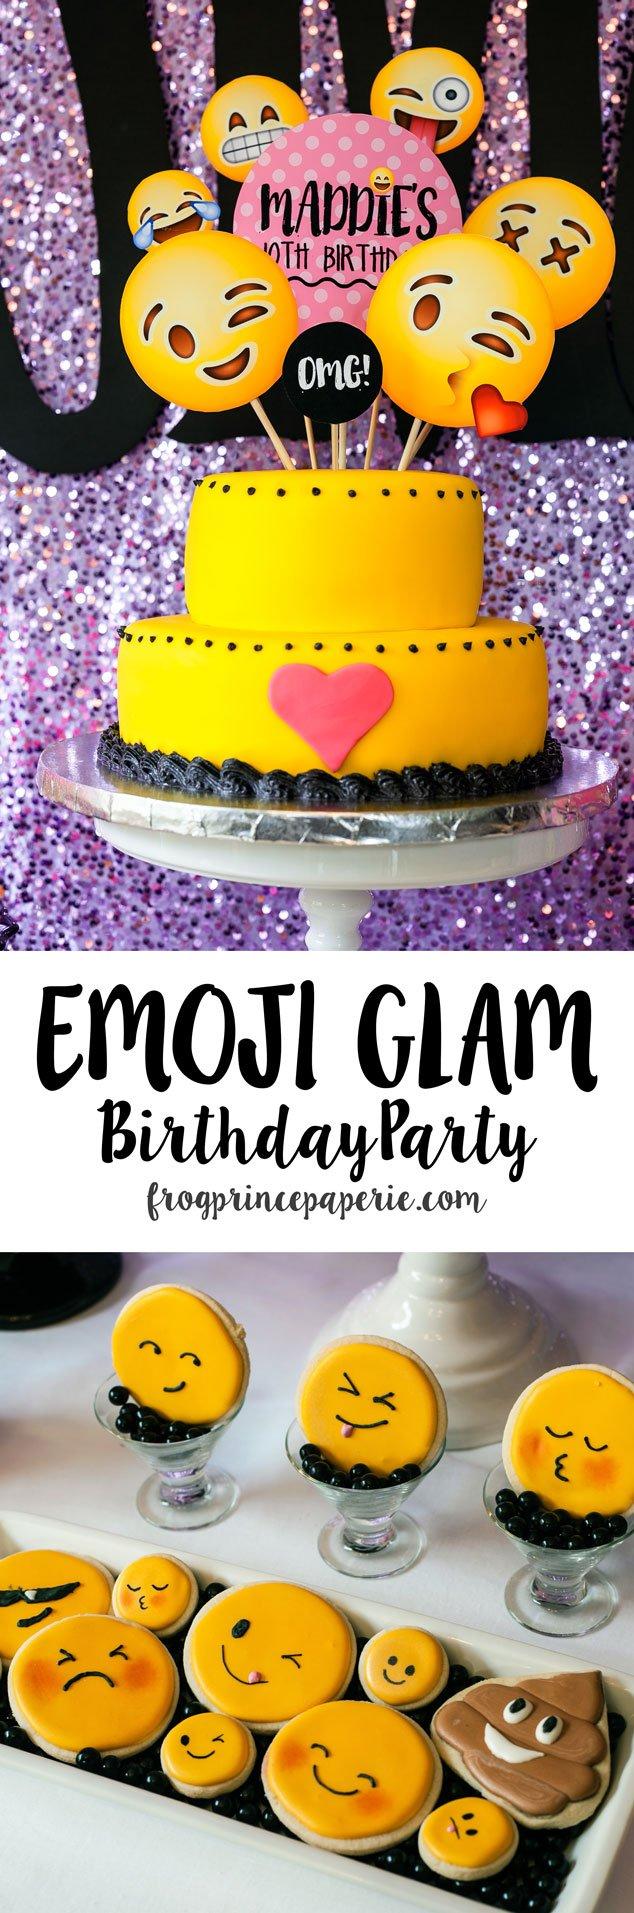 Glam Emoji Birthday Party Ideas